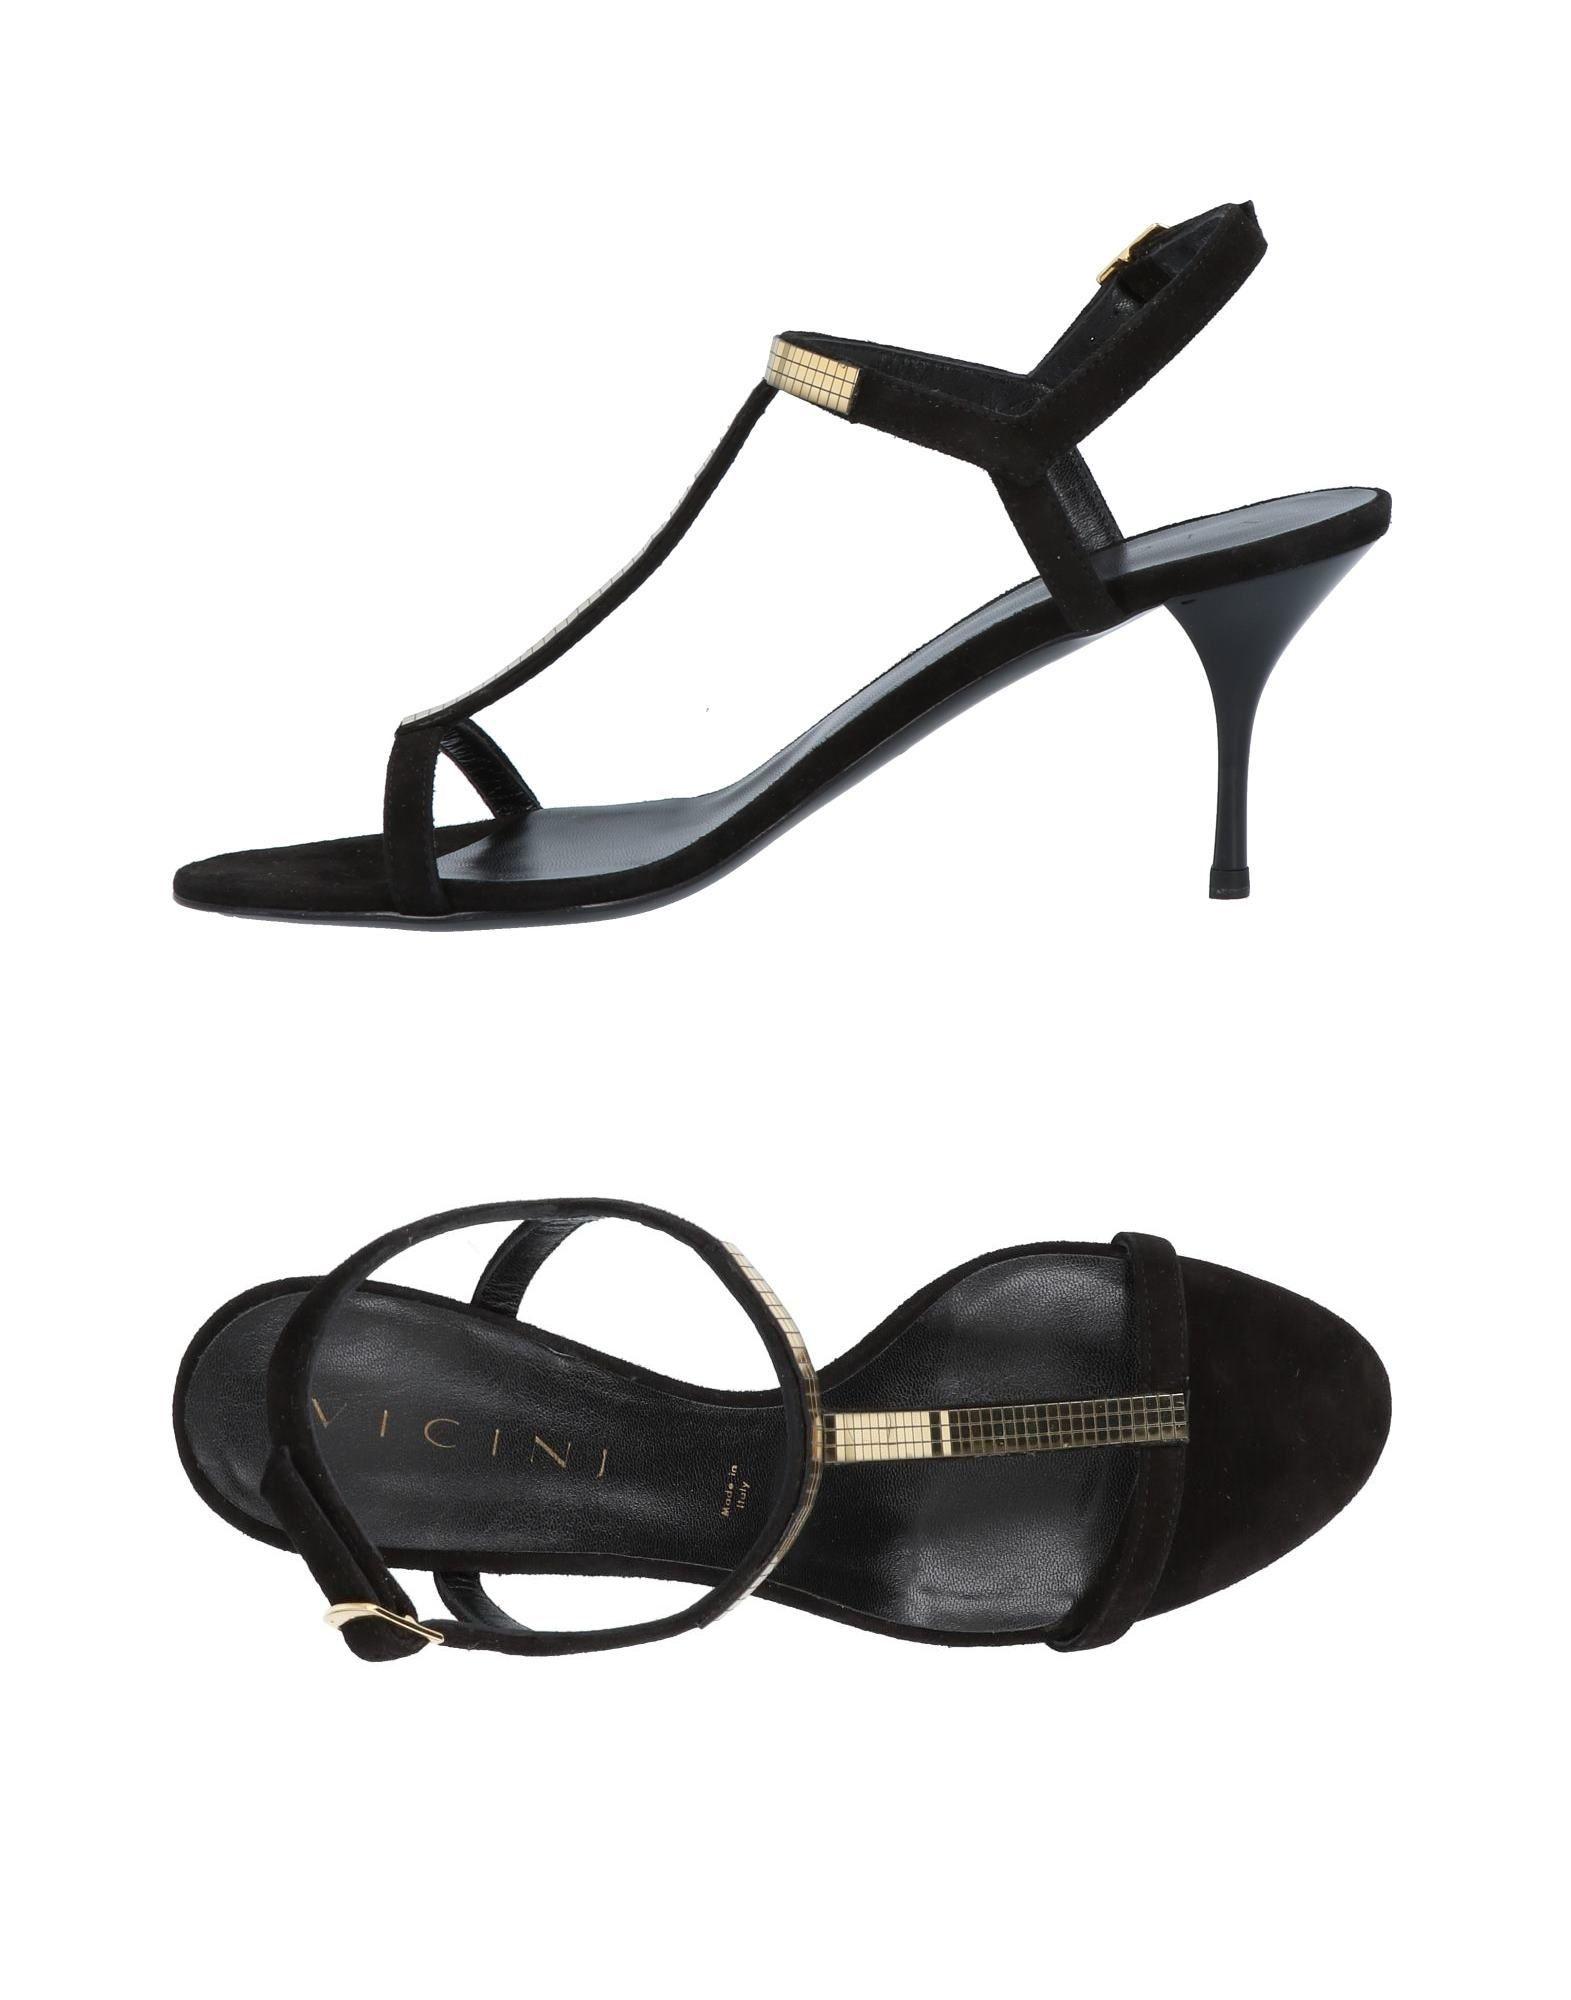 Vicini Sandalen Damen  11422693SG Gute Qualität beliebte Schuhe